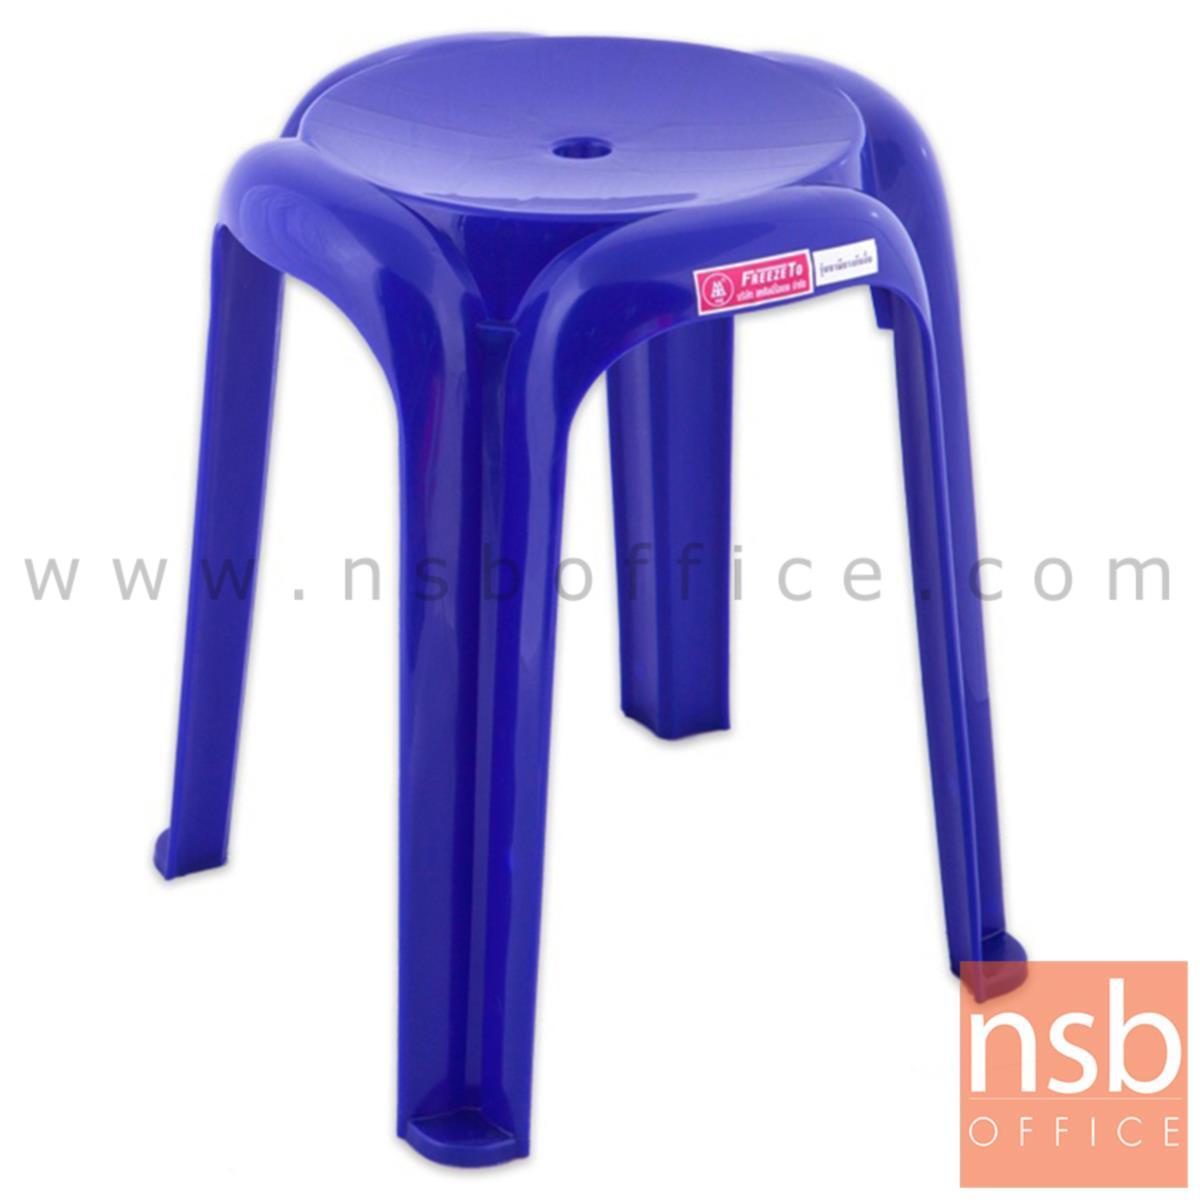 B10A062:เก้าอี้พลาสติก รุ่น BEIJING_CHAIR ซ้อนทับได้ (ผลิตทั้งเกรด A และ B)